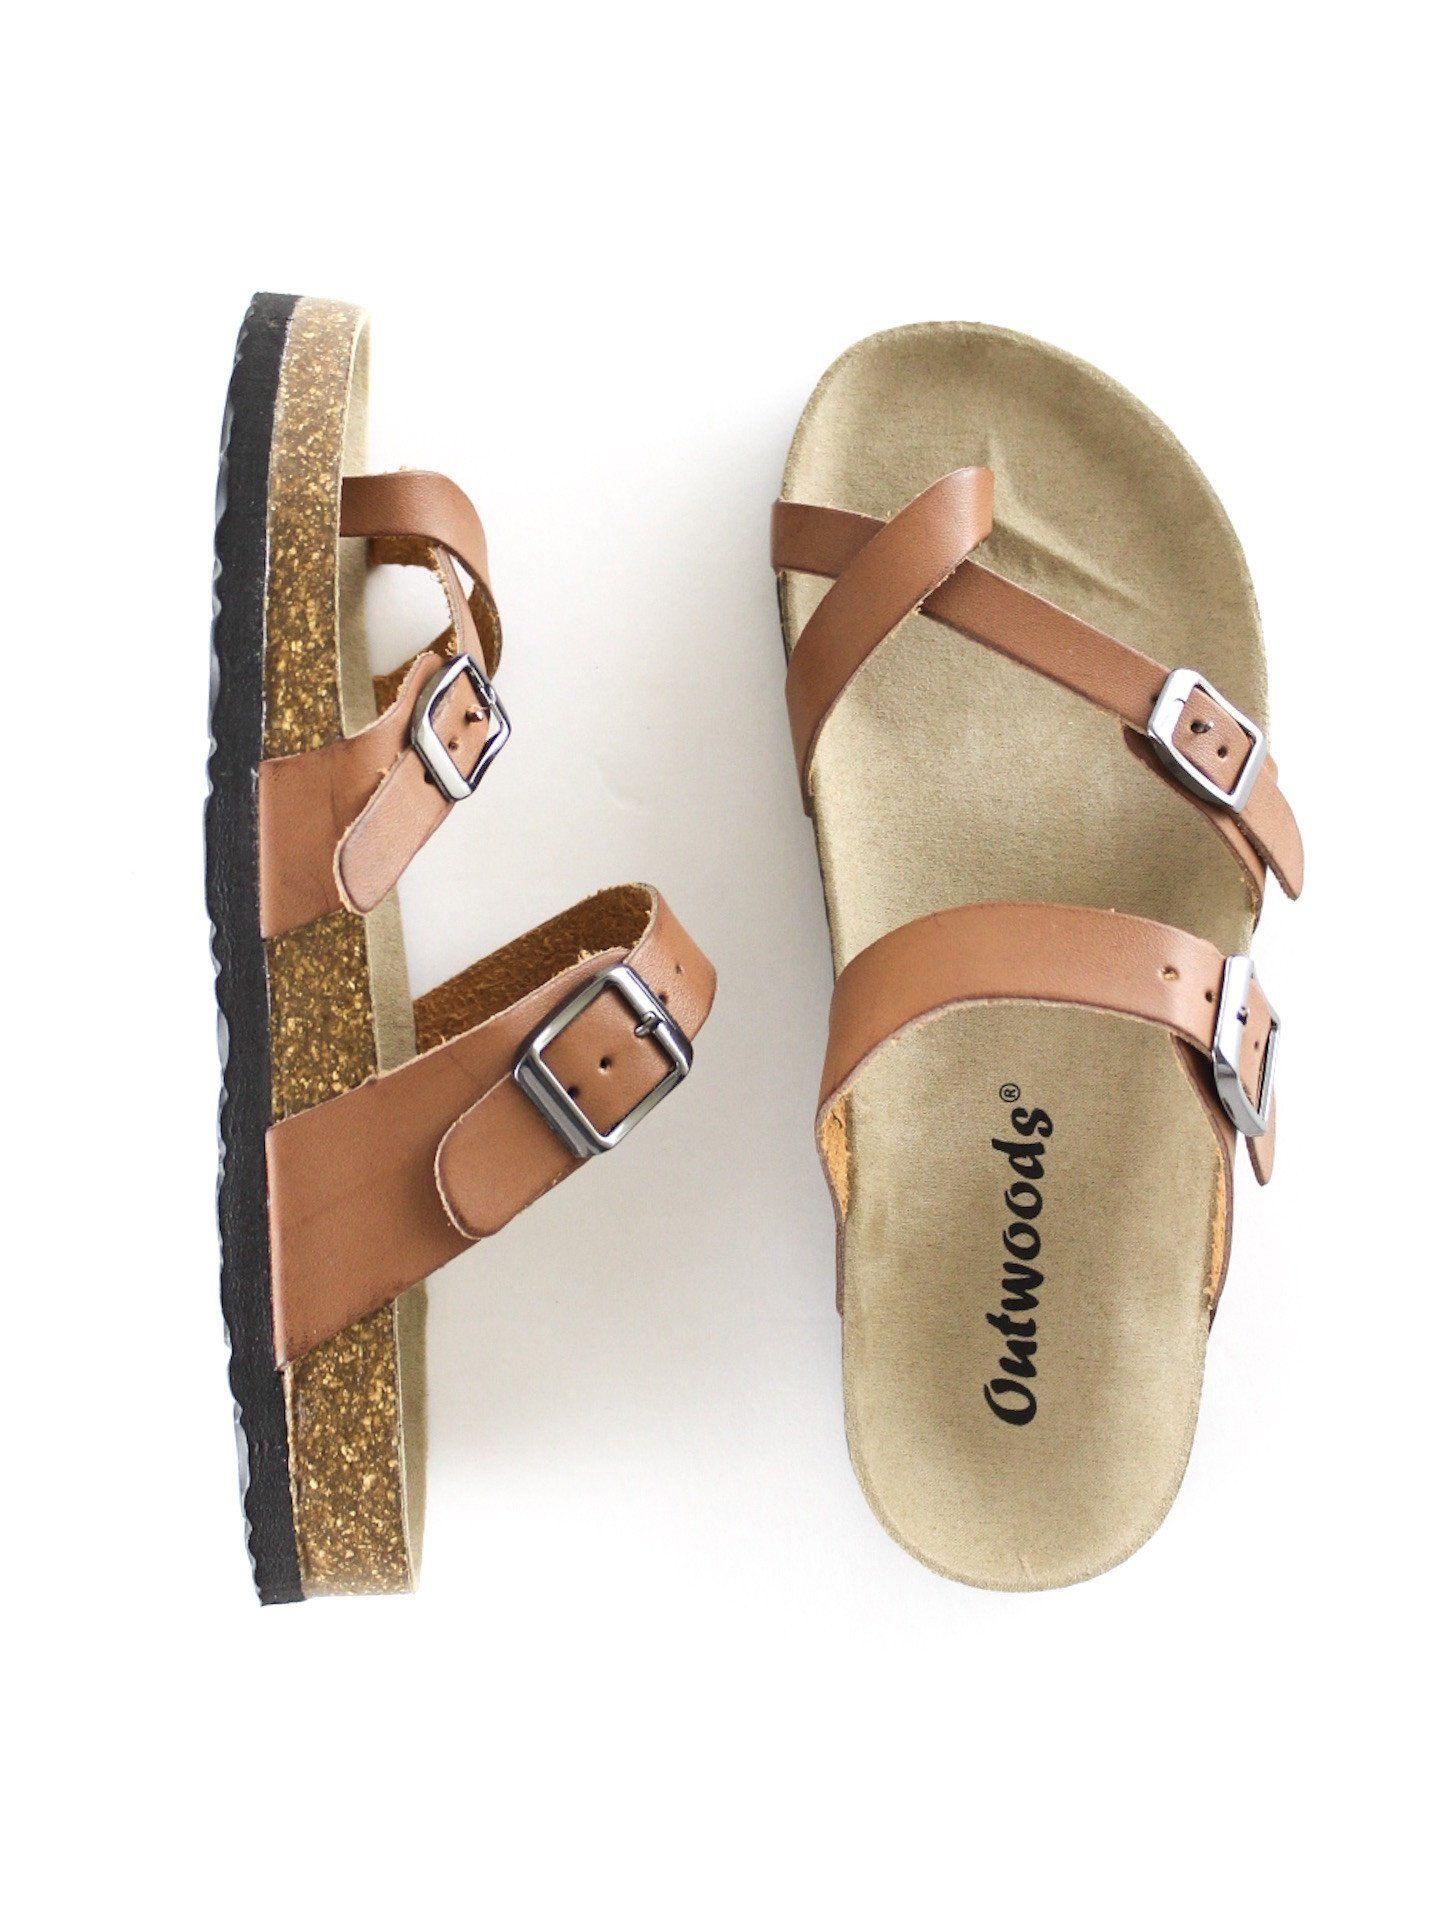 Double Buckle Sandals   Buckle sandals